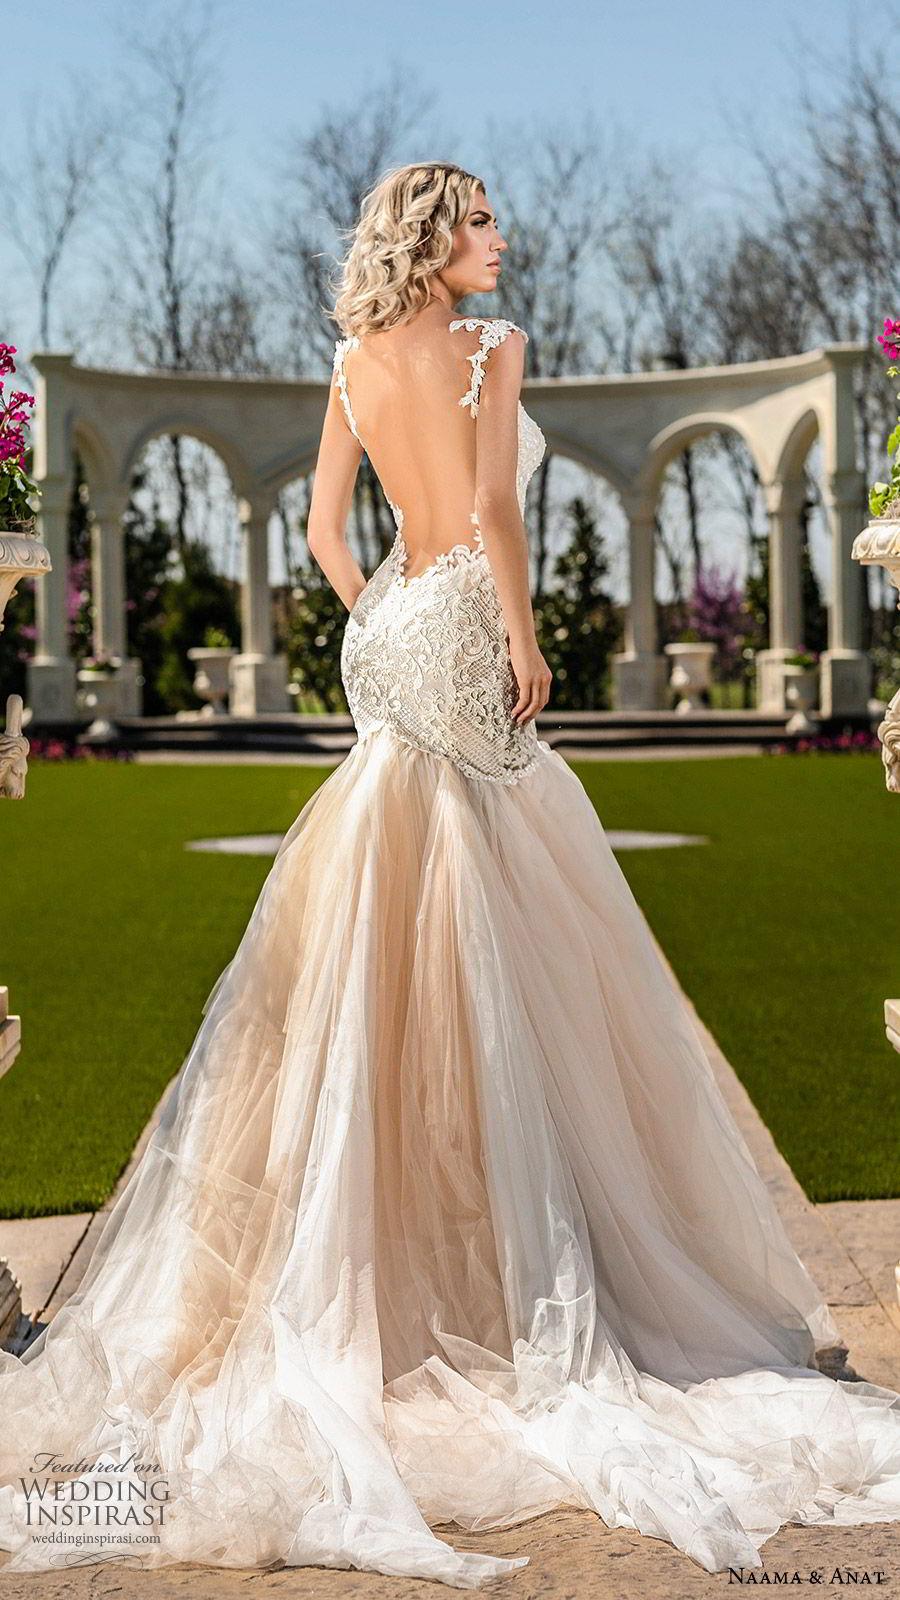 naama anat spring 2020 bridal cap sleeves split sweetheart neckline lace bodice ruffle skirt mermaid wedding dress (2) romantic chapel train open back blush bv